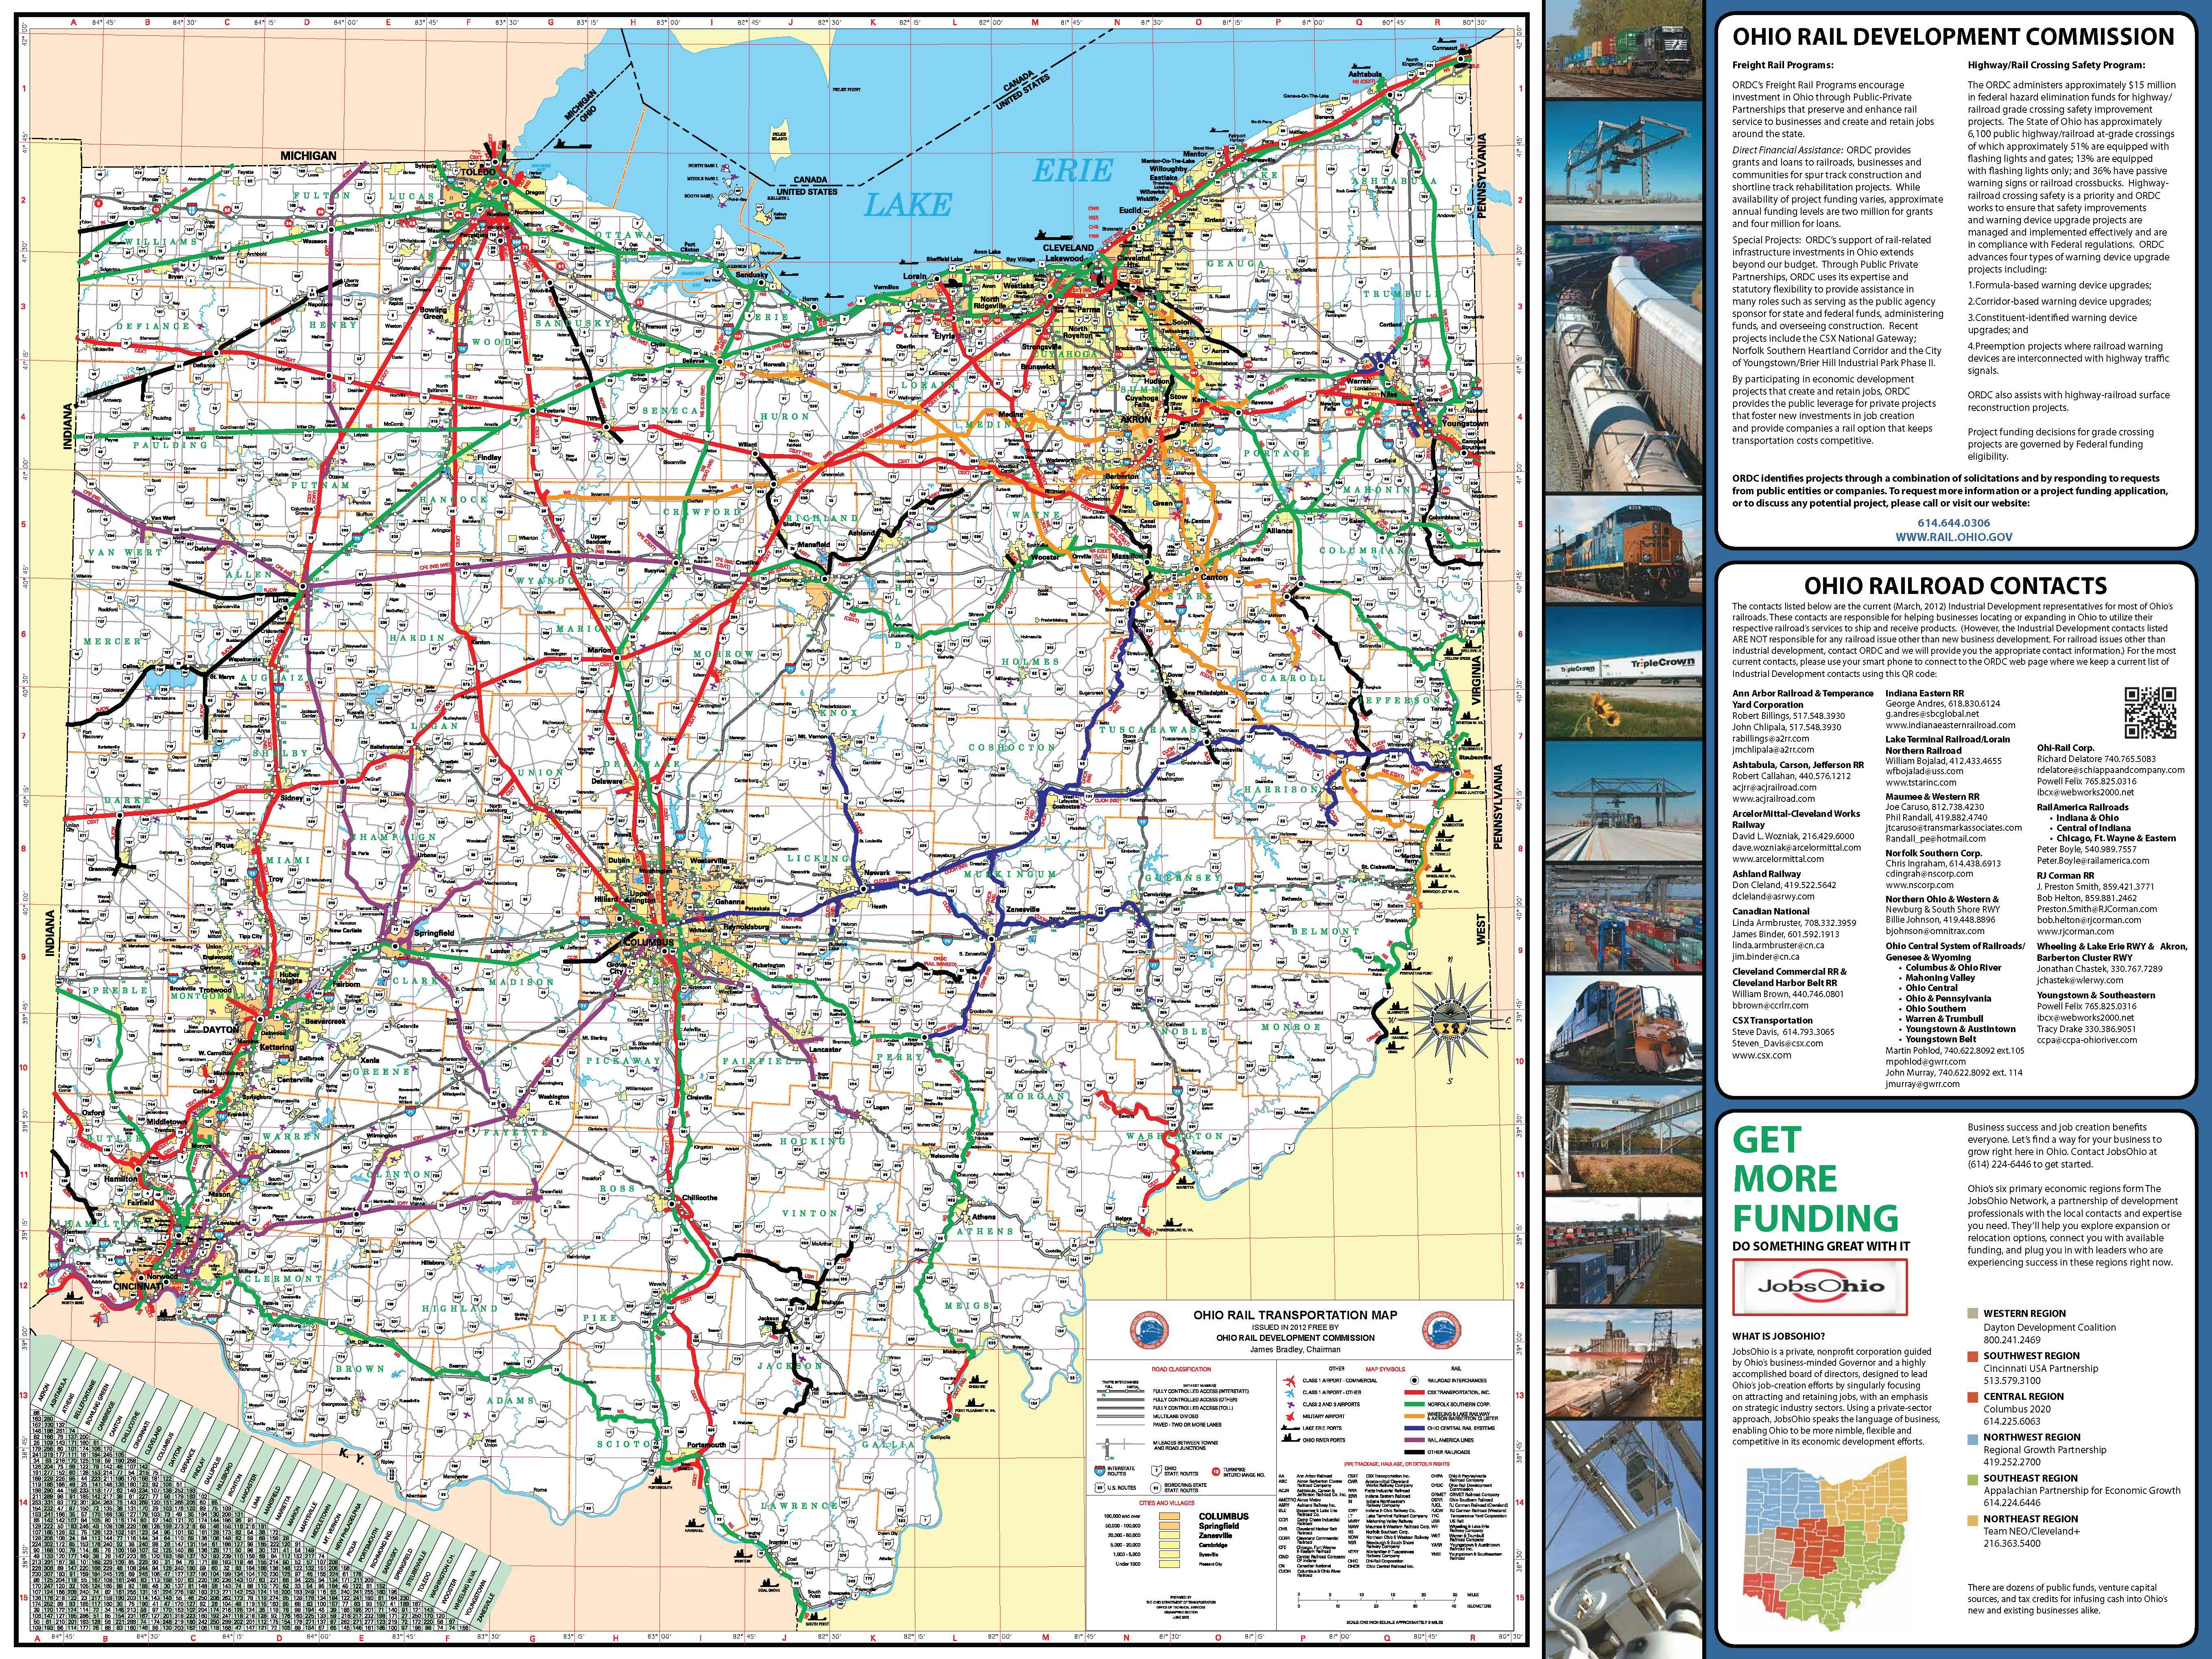 Ohio Rail Transportation Map